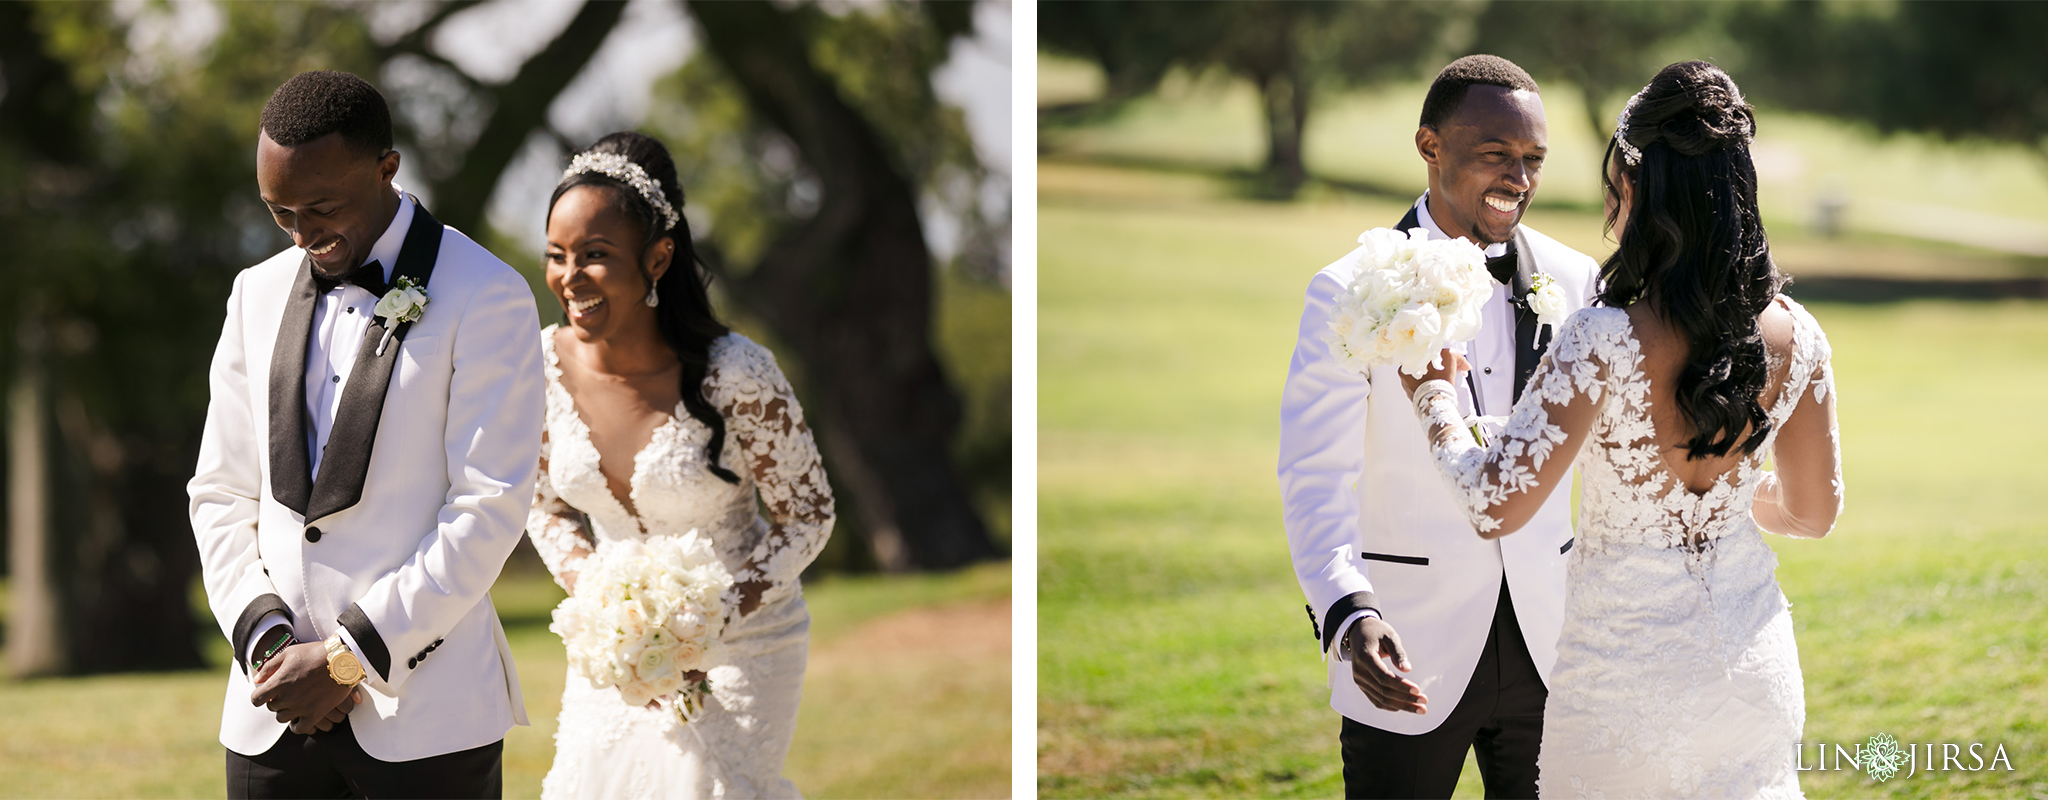 13 Los Verdes Golf Course Palos Verdes Kenyan Wedding Photography